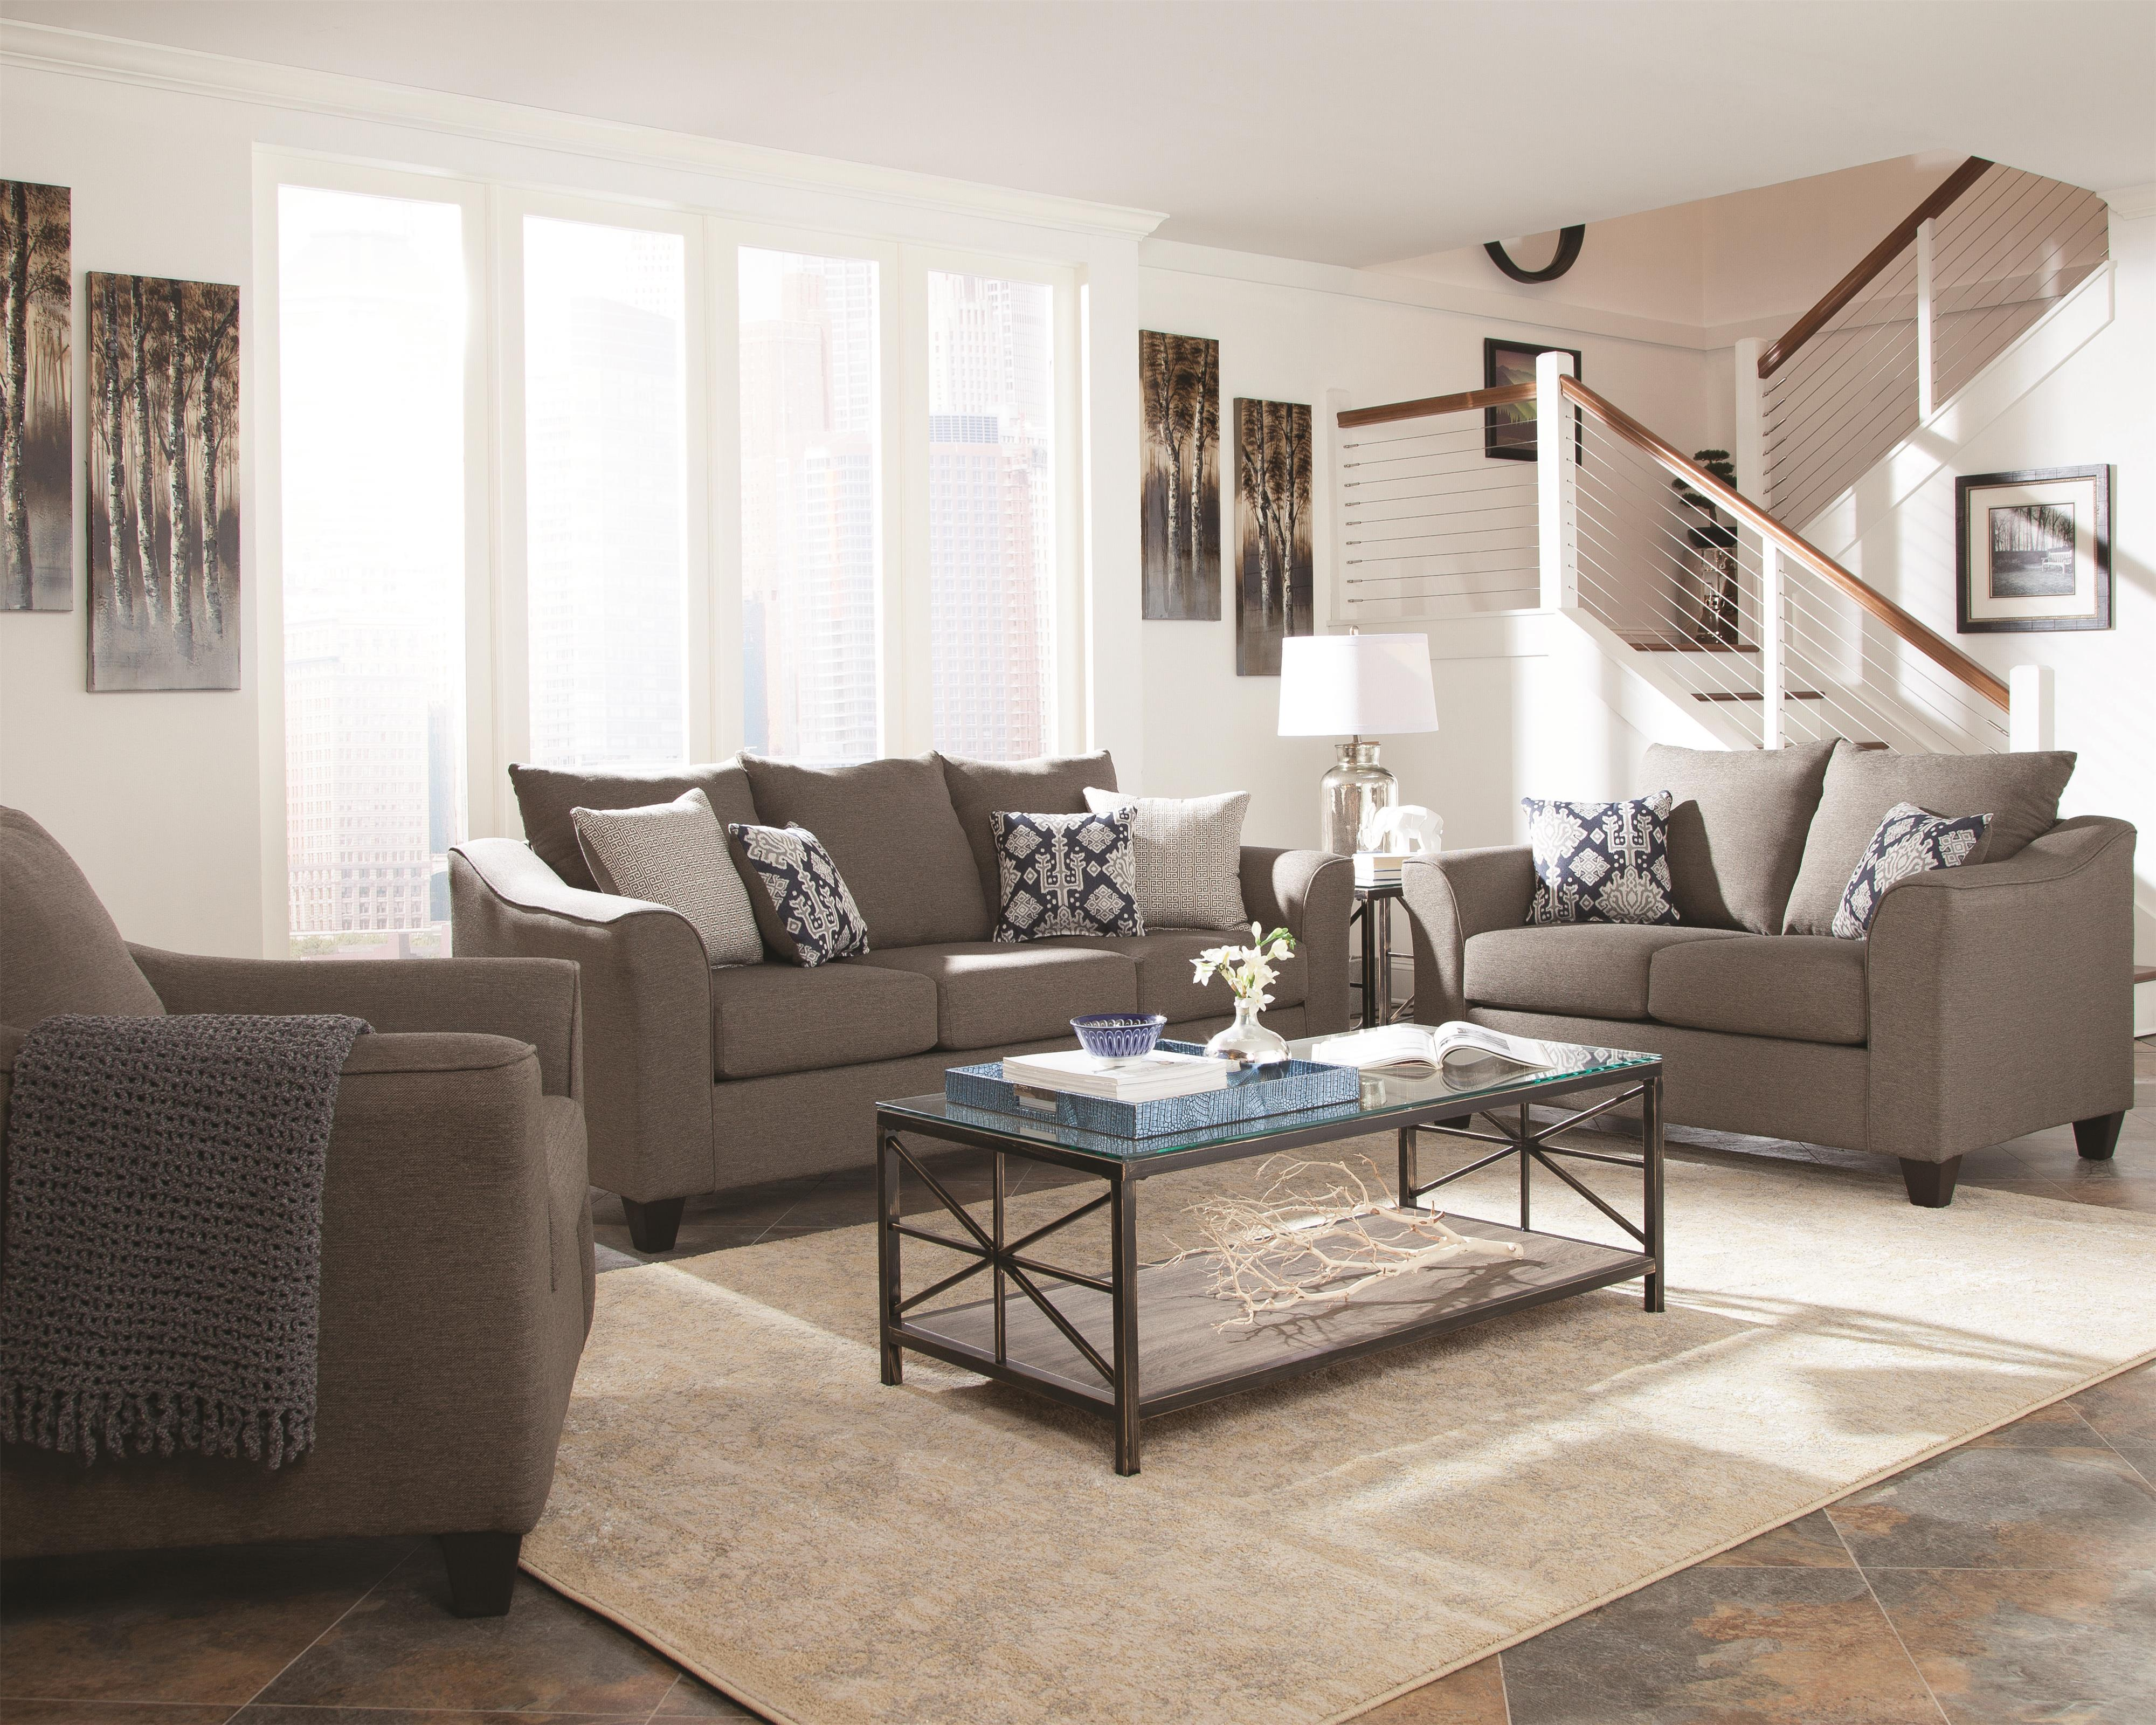 Coaster Salizar Living Room Group - Item Number: 50602 Living Room Group 1